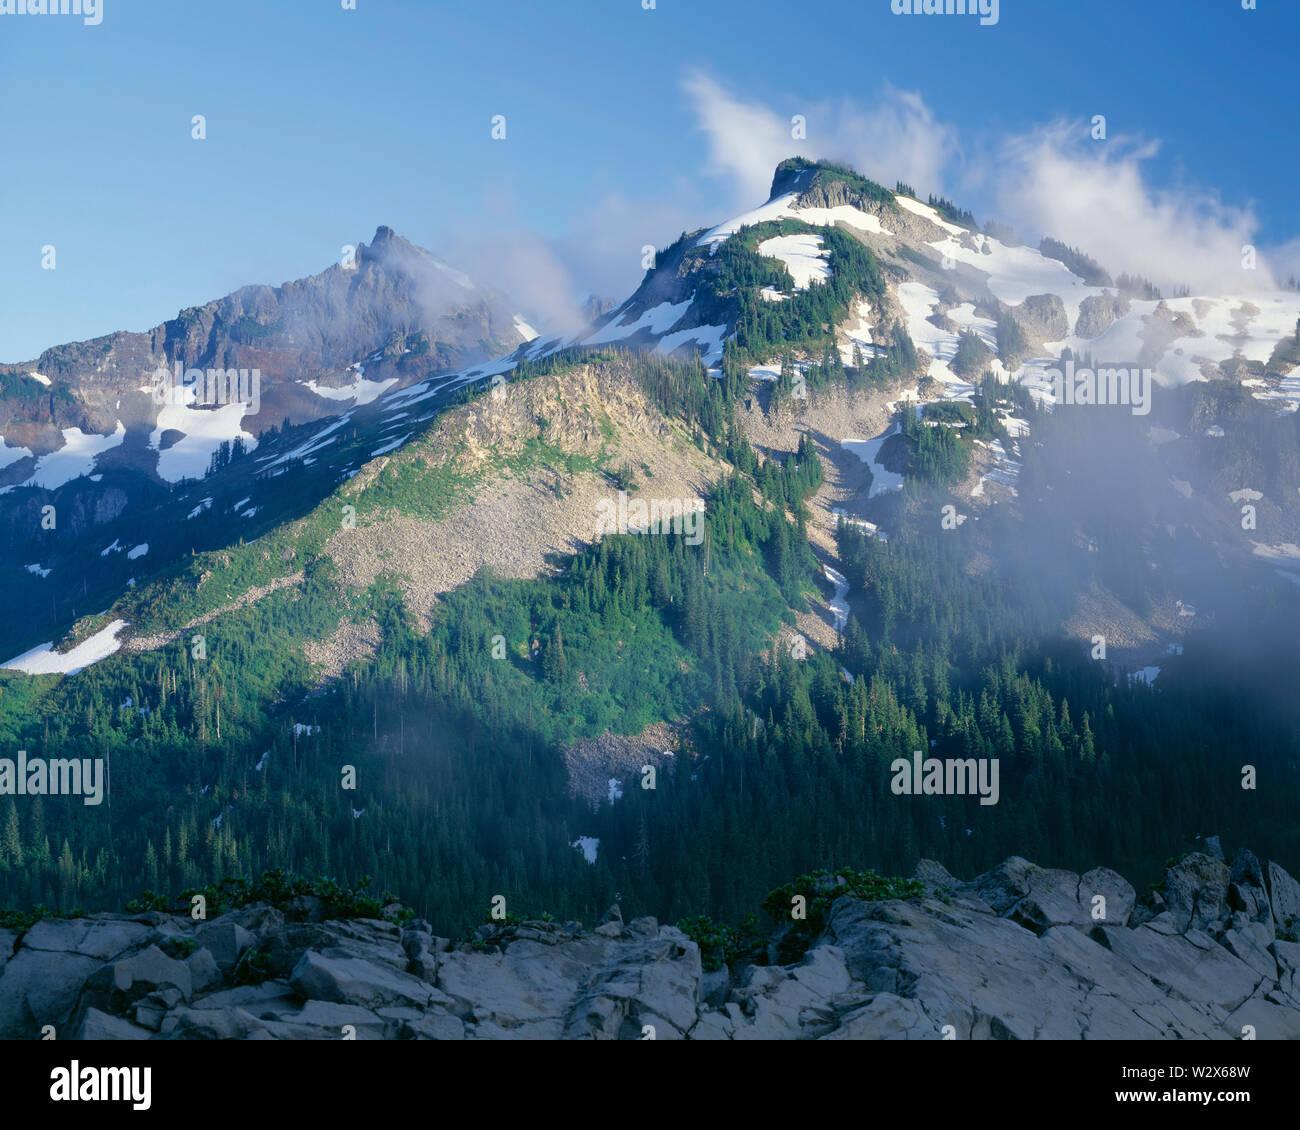 USA, Washington, Mt. Rainier National Park, Evening light on Unicorn Peak and other peaks of  the Tatoosh Range with swirling clouds. - Stock Image